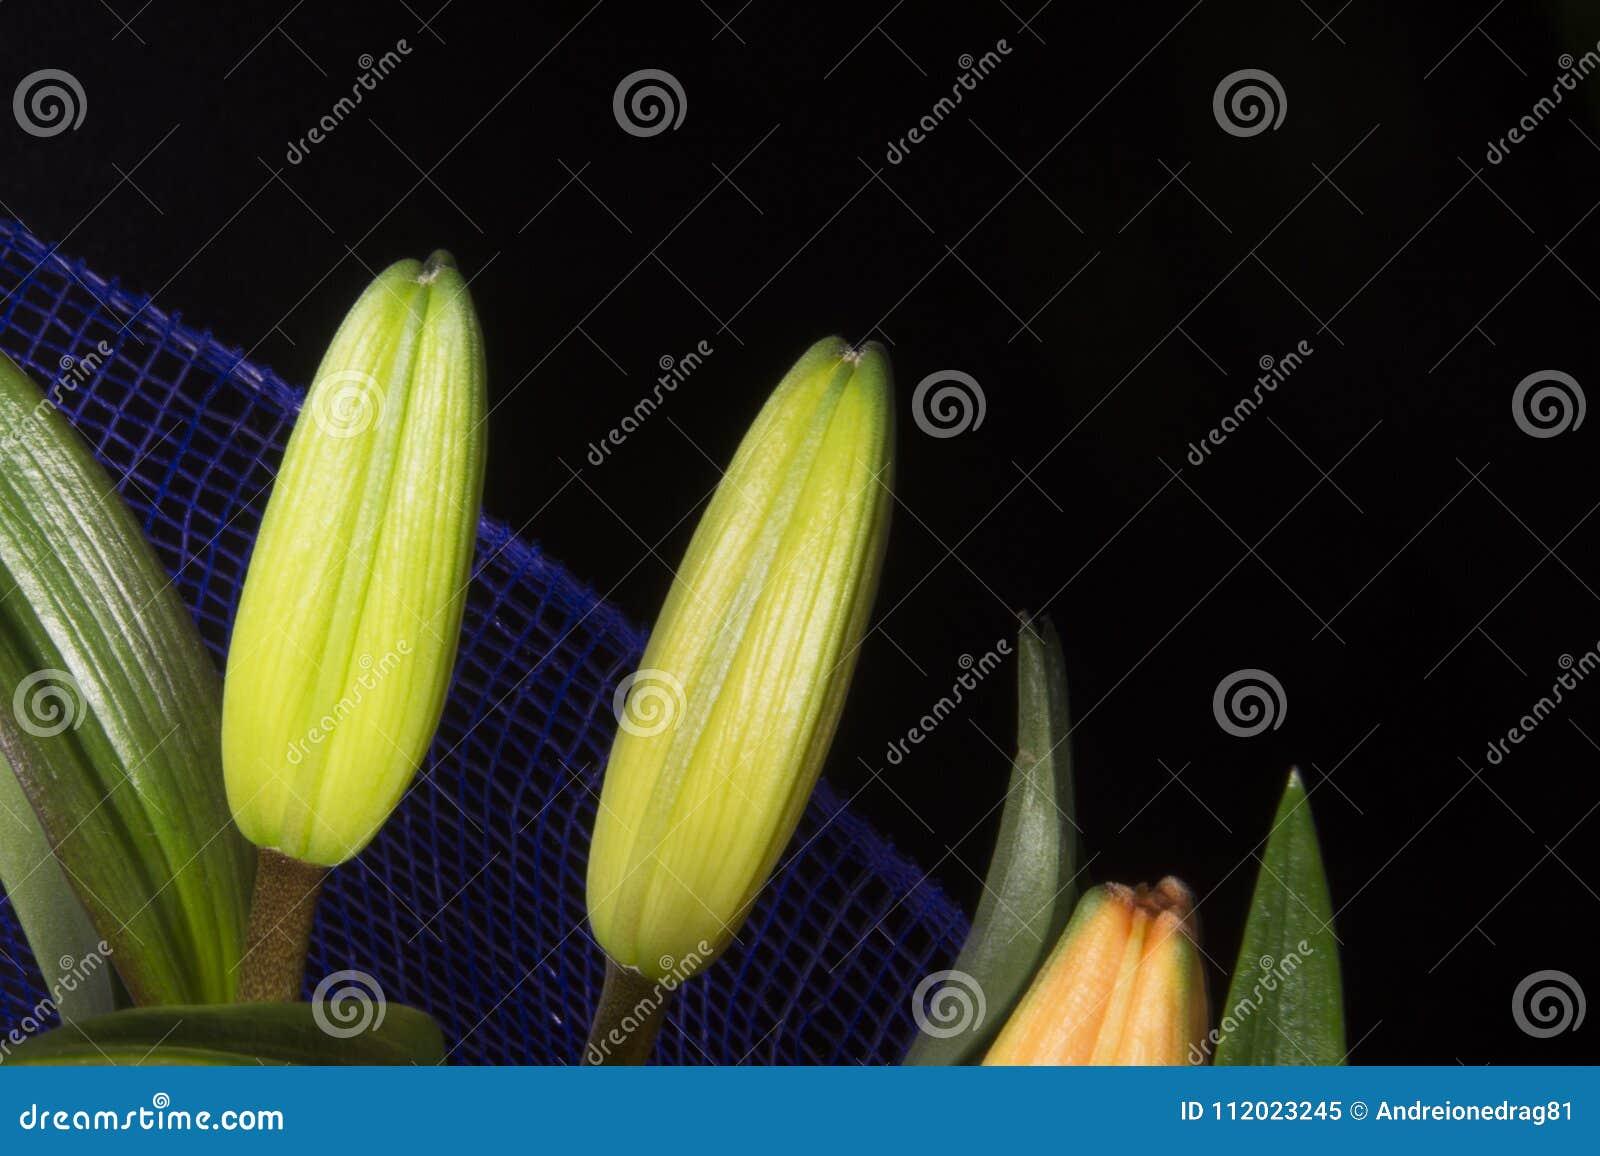 Beautiful orange lily flower on black background stock image image beautiful orange lily flower on black background izmirmasajfo